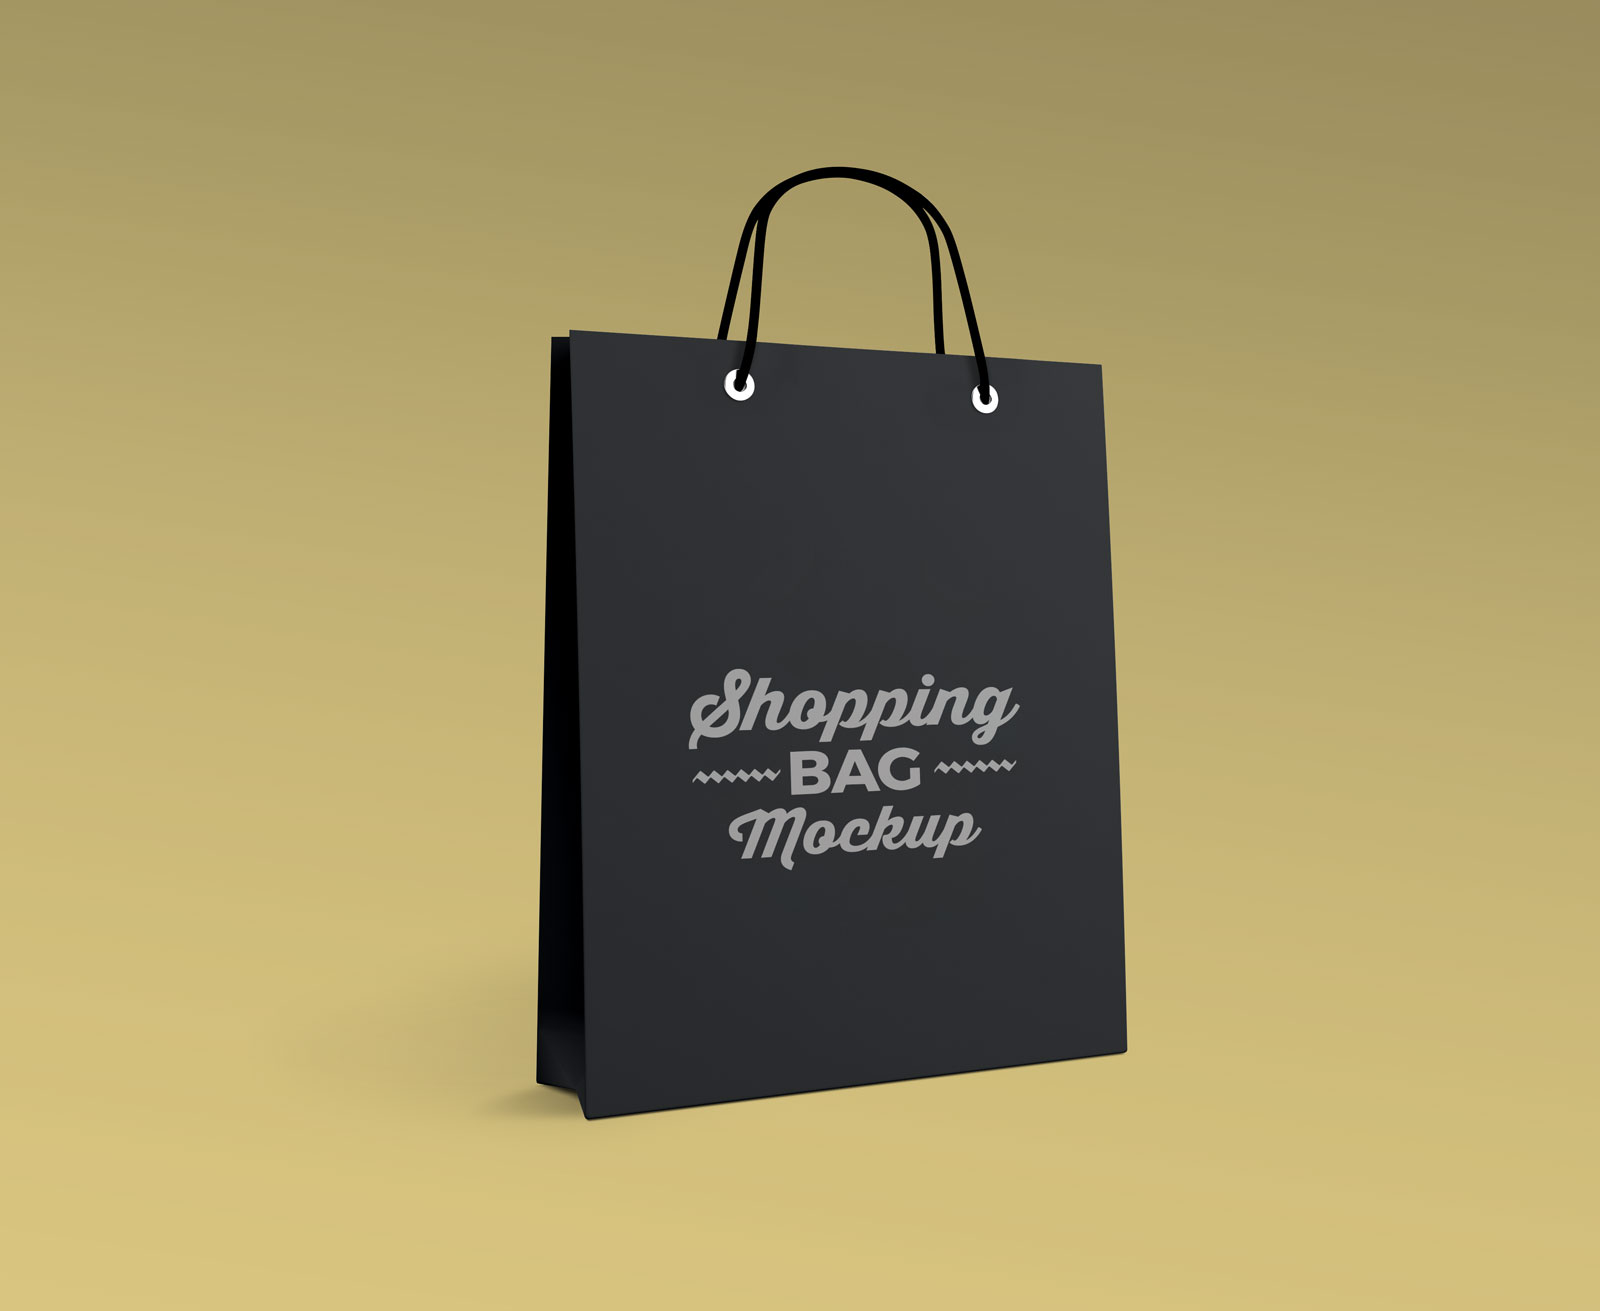 Free Photorealistic Paper Shopping Bag Mockup Psd Good